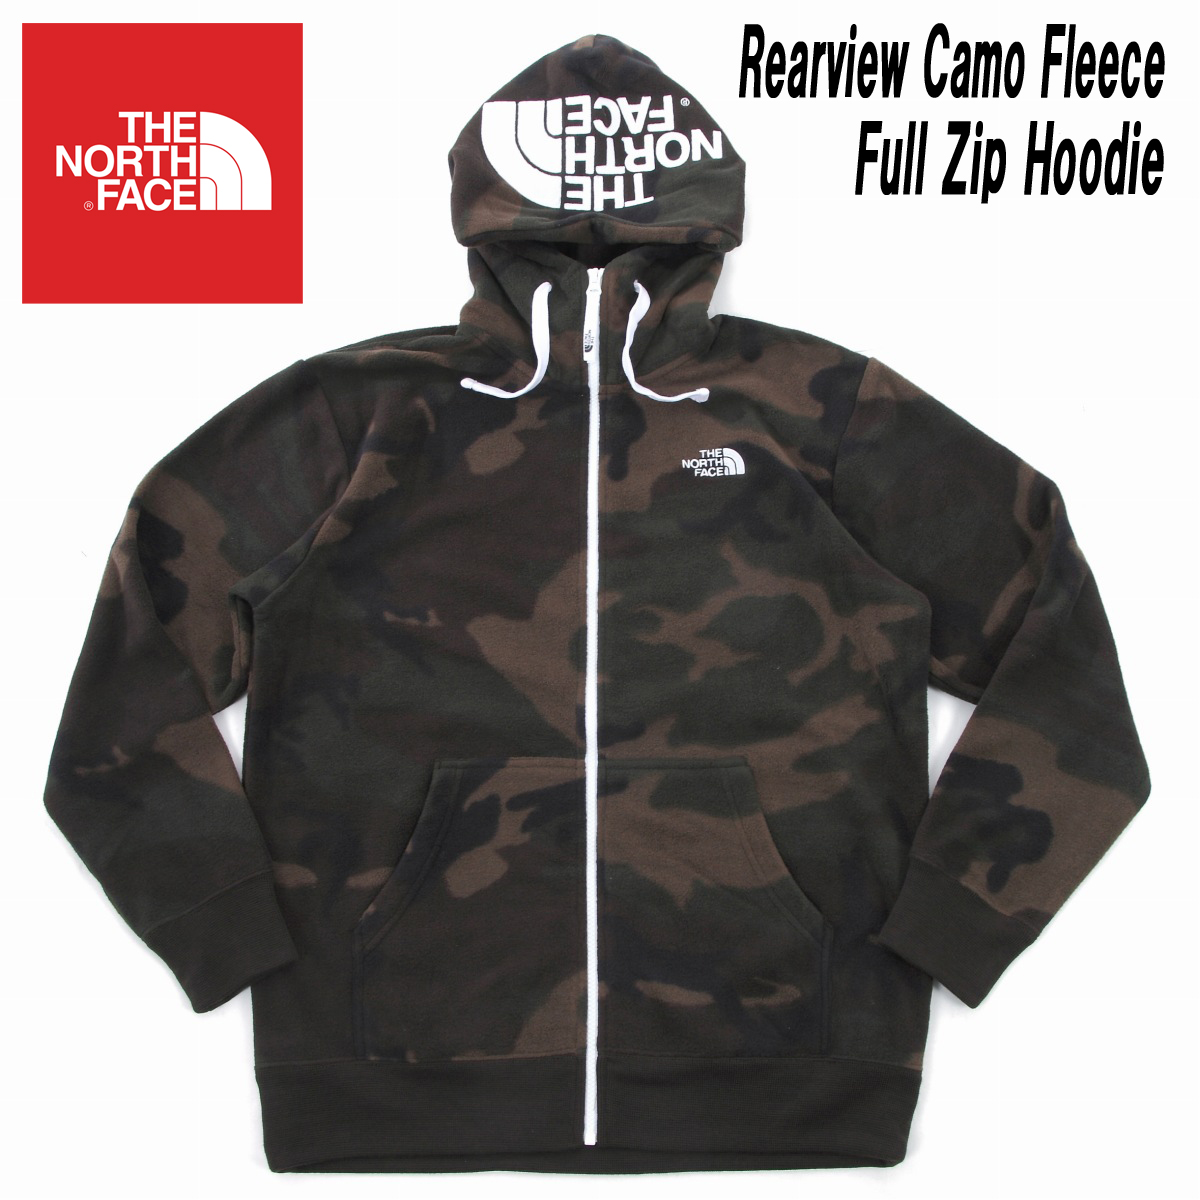 The north face / NORTH FACE REARVIEW CAMO FLEECE HOODIE rear Camo Fleece  Full Zip Hoodie